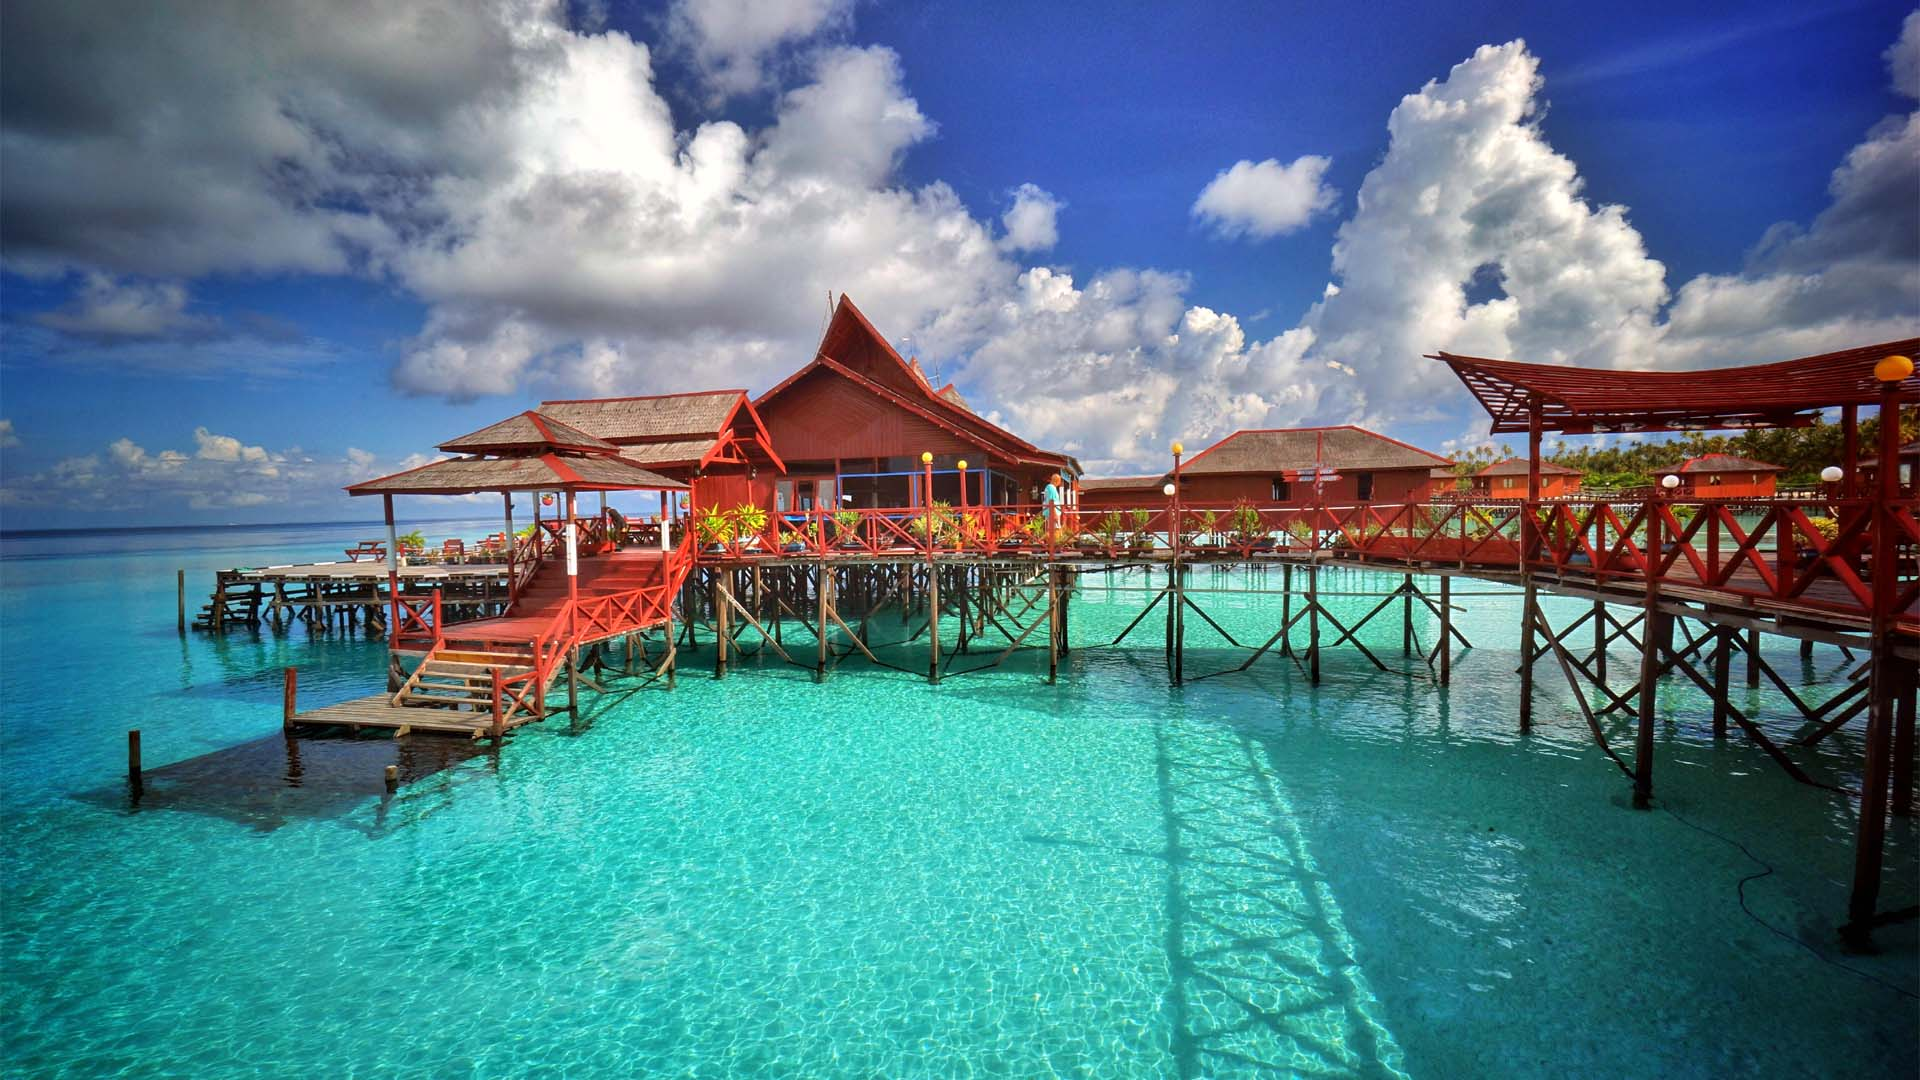 maratua paradise resort on the water